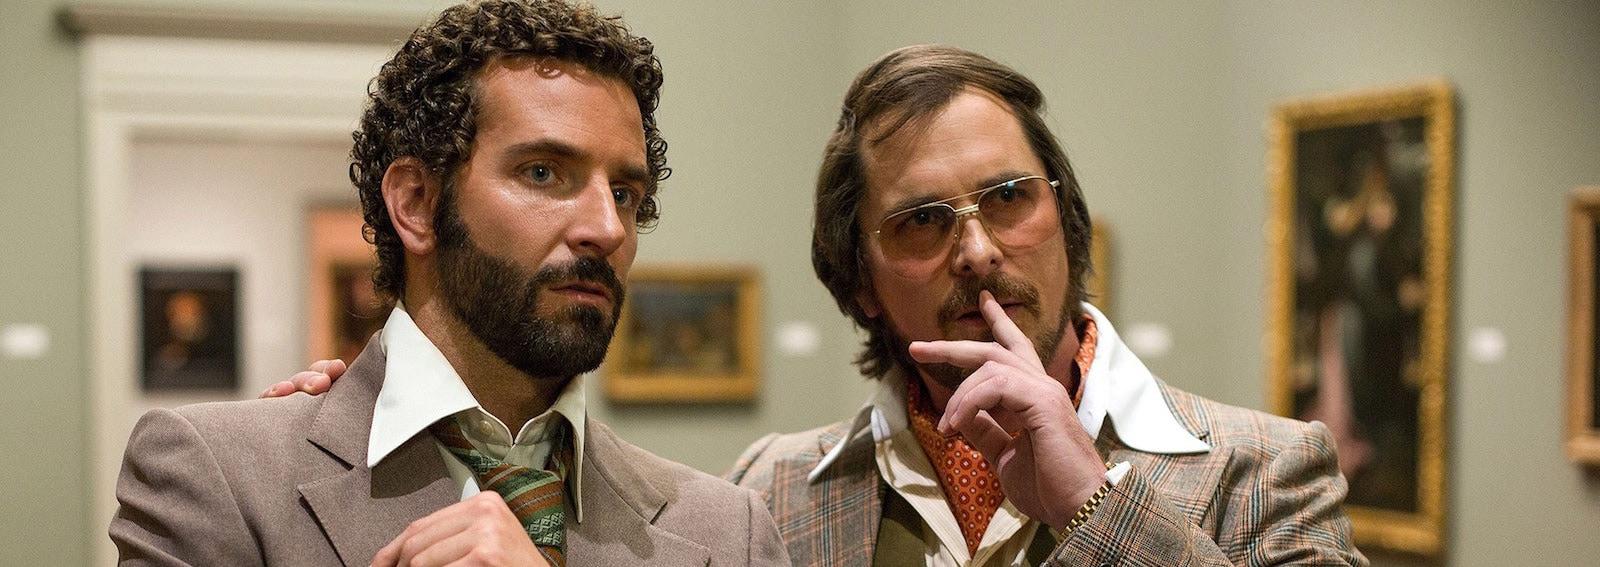 Bradley Cooper giacca marrone